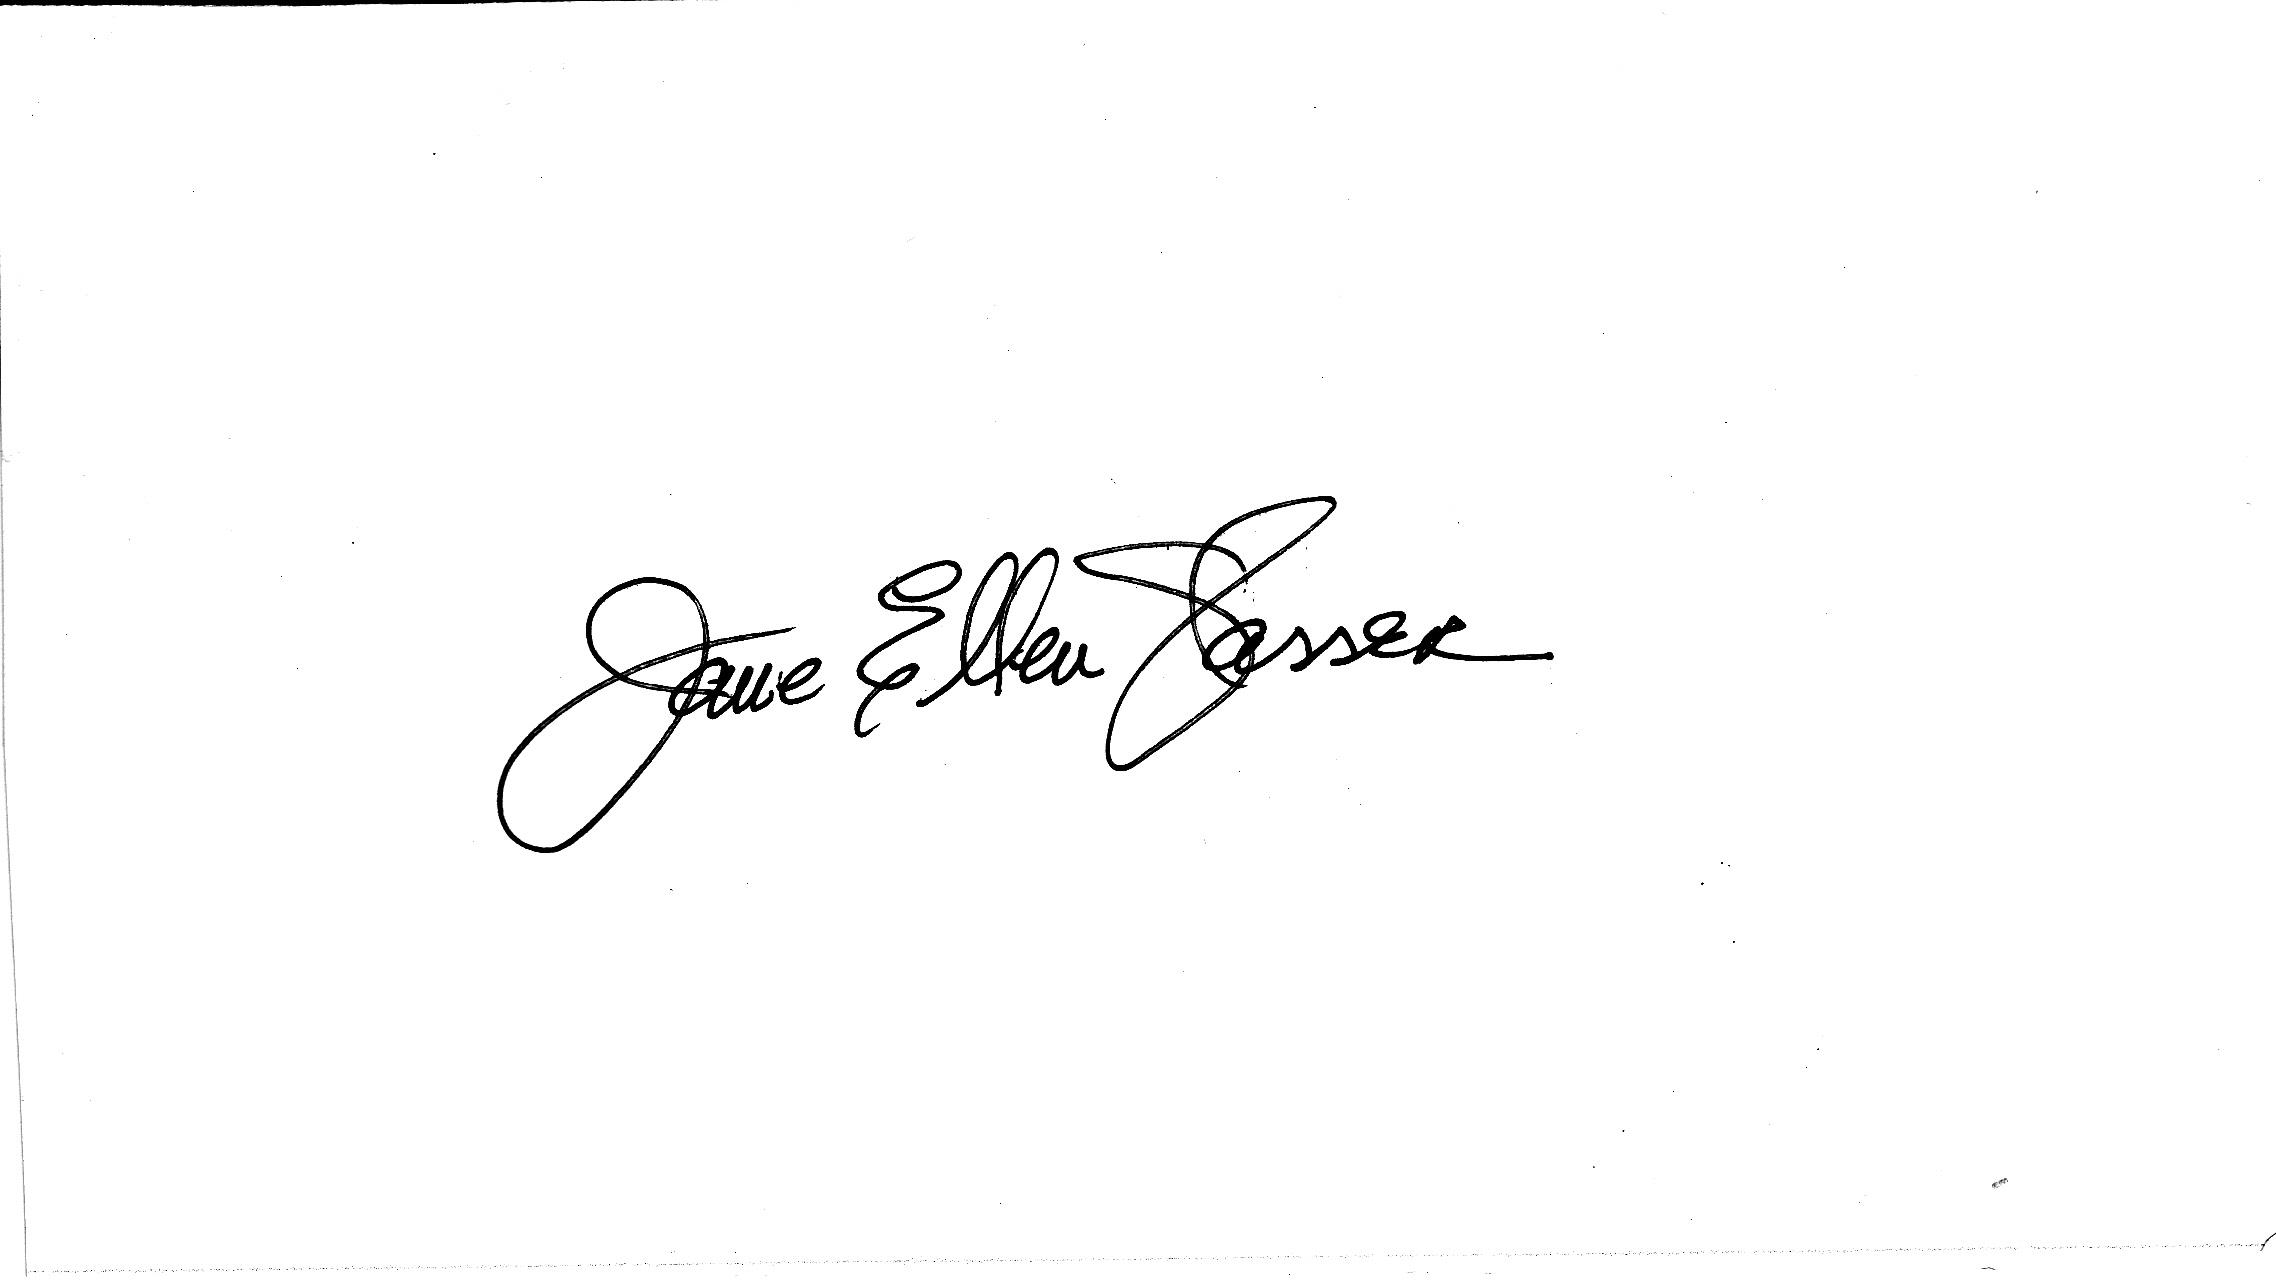 Jane Glasser Signature